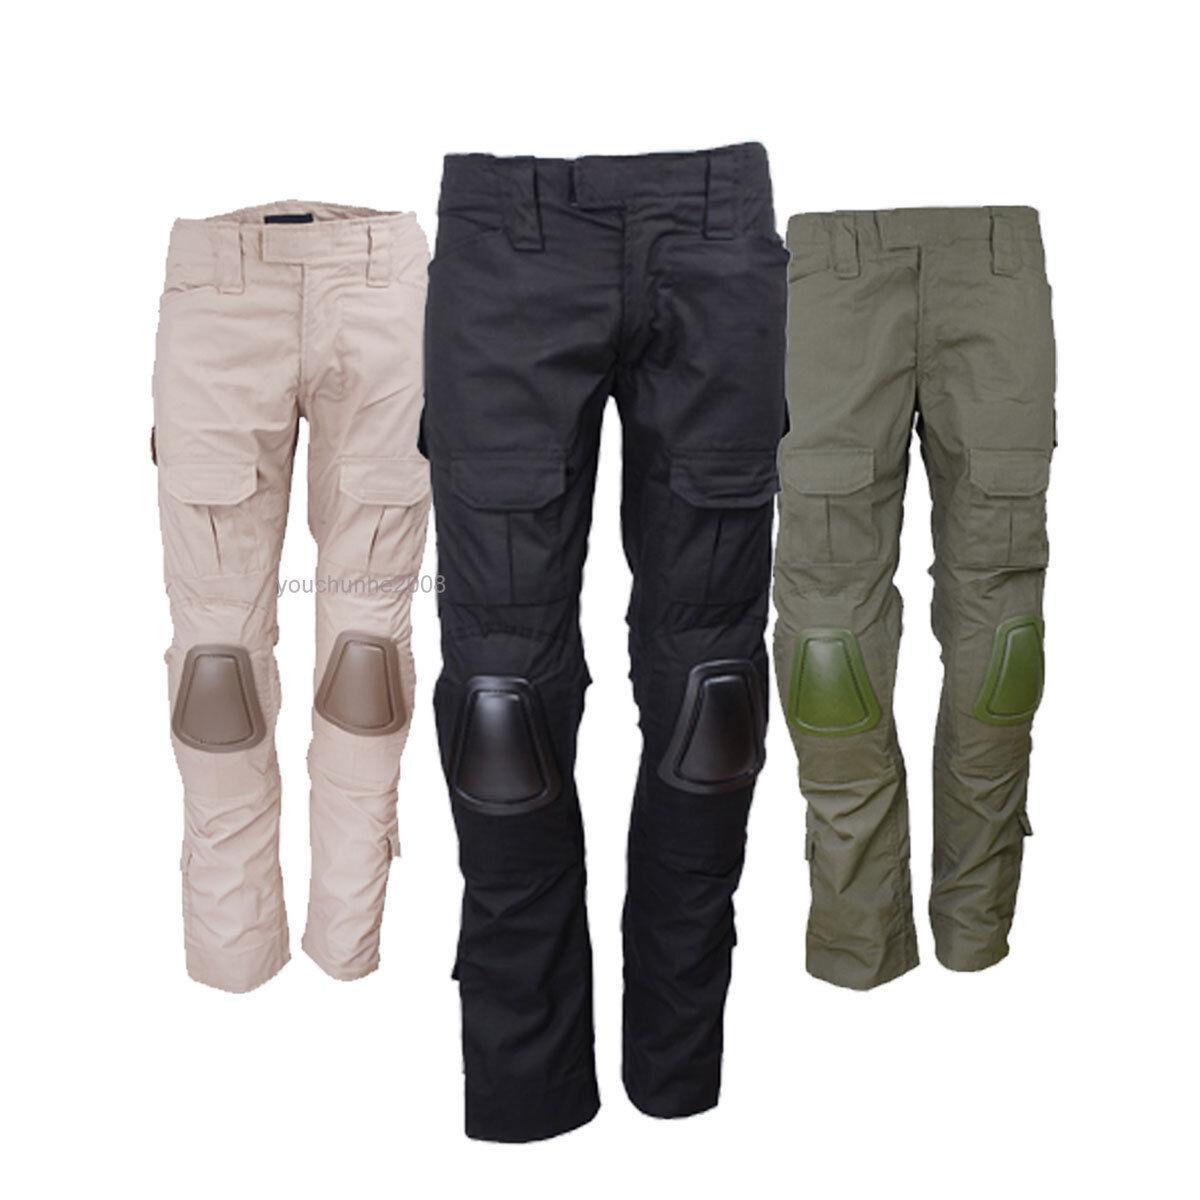 TACTICAL BDU GEN2 COMBAT PANTS WITH KNEE PADS AIRSOFT PANTS